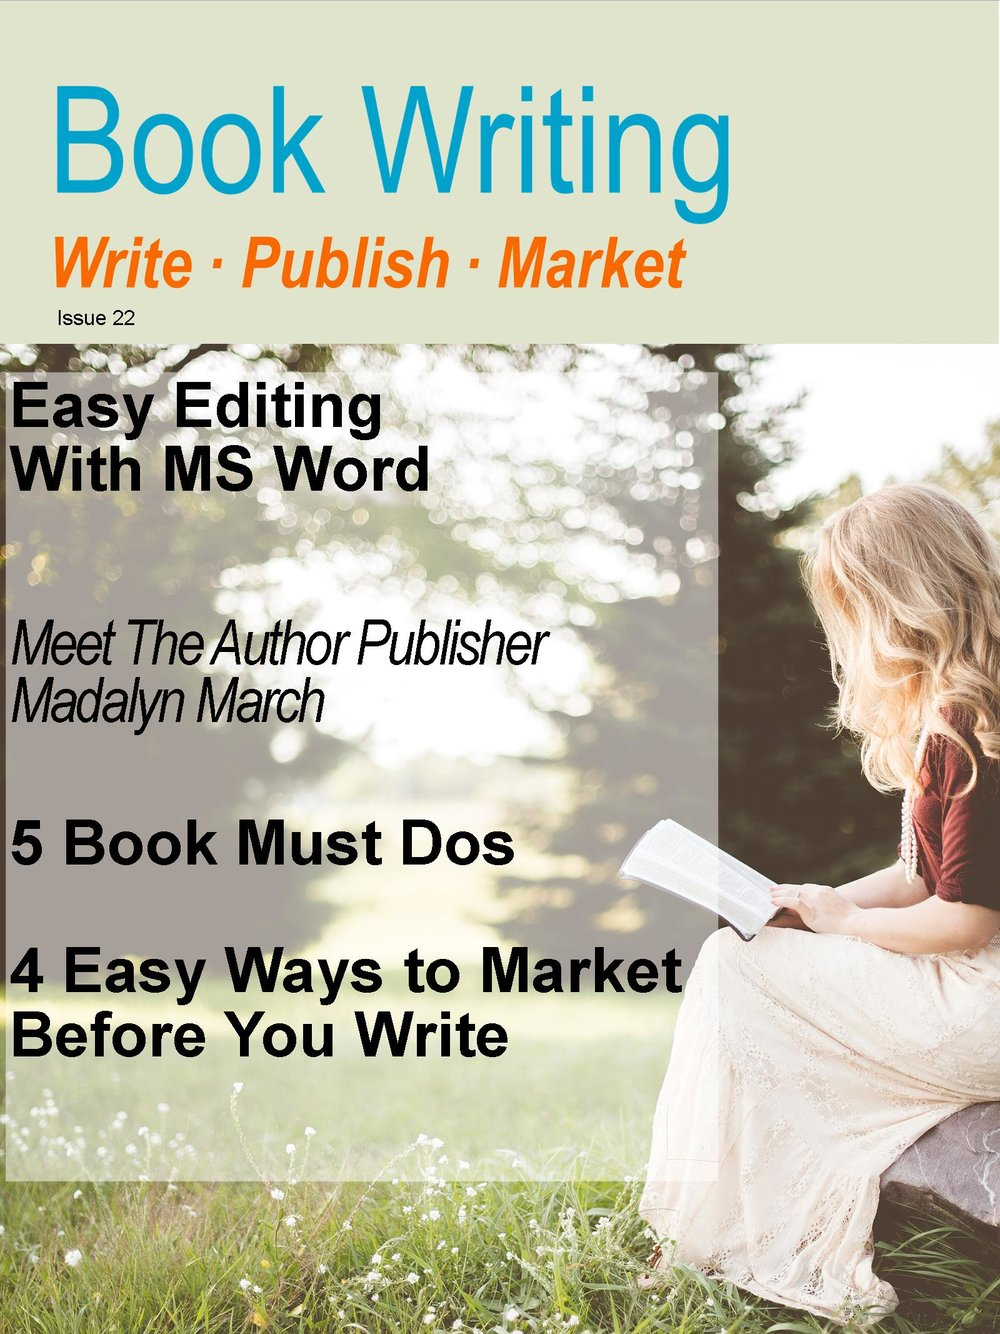 Book Writing Magazine – Book Writing